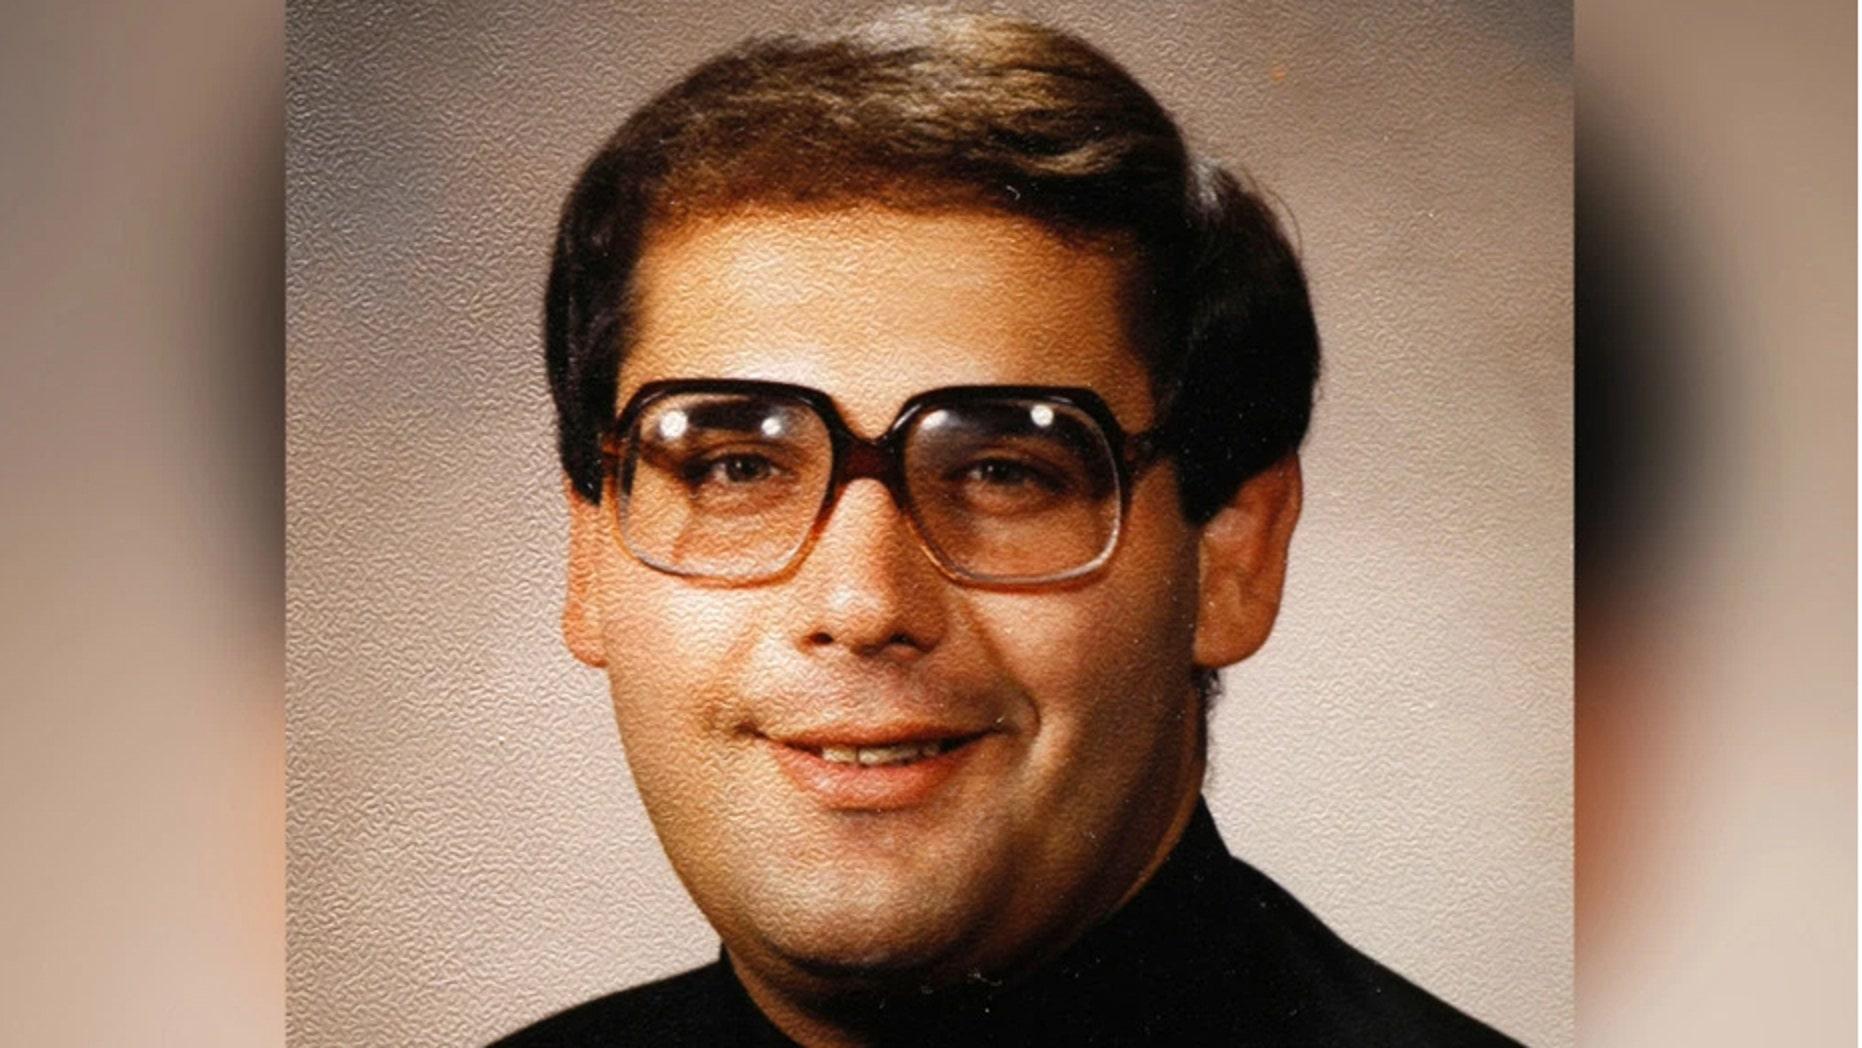 John Capparelli, 70, was found dead Saturday inside the kitchen of his Nevada hoime.